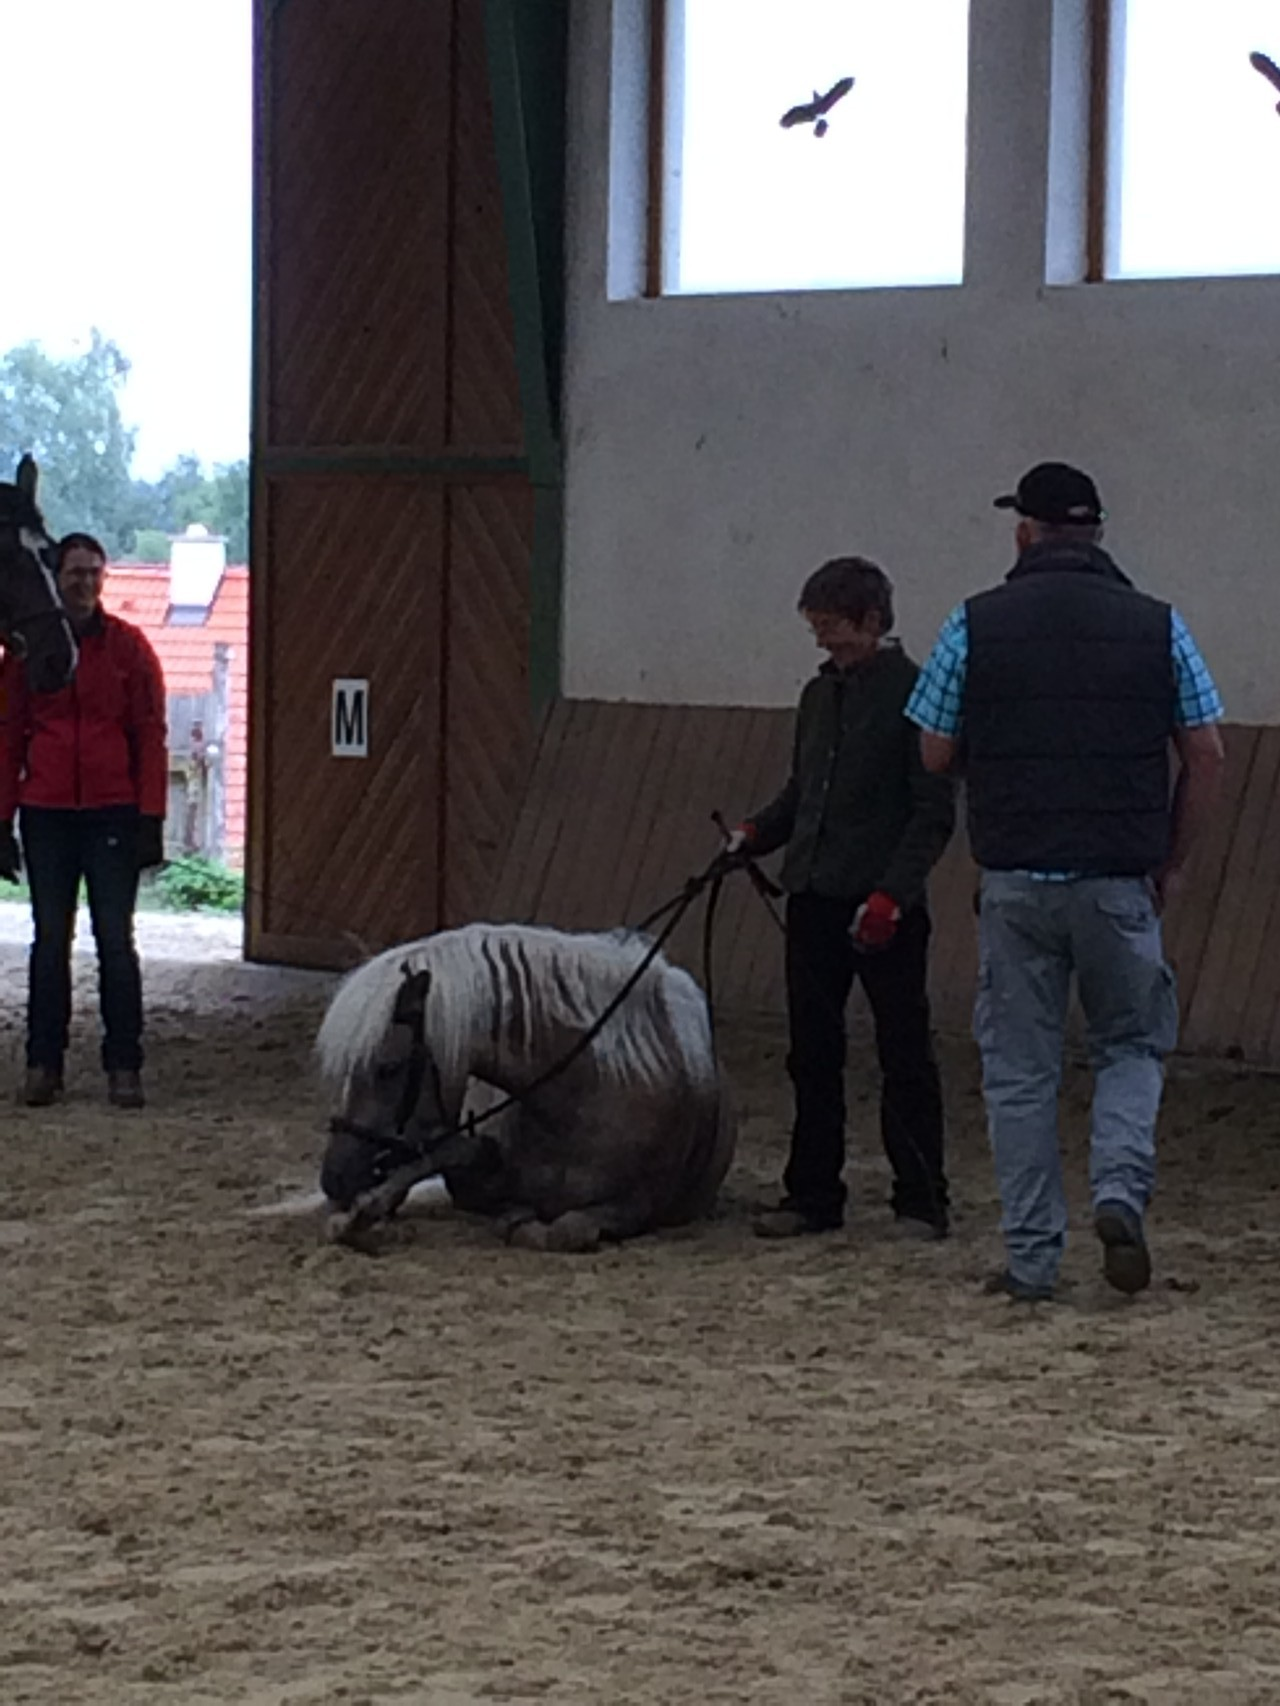 Gijana mit Karin und Wolfgang